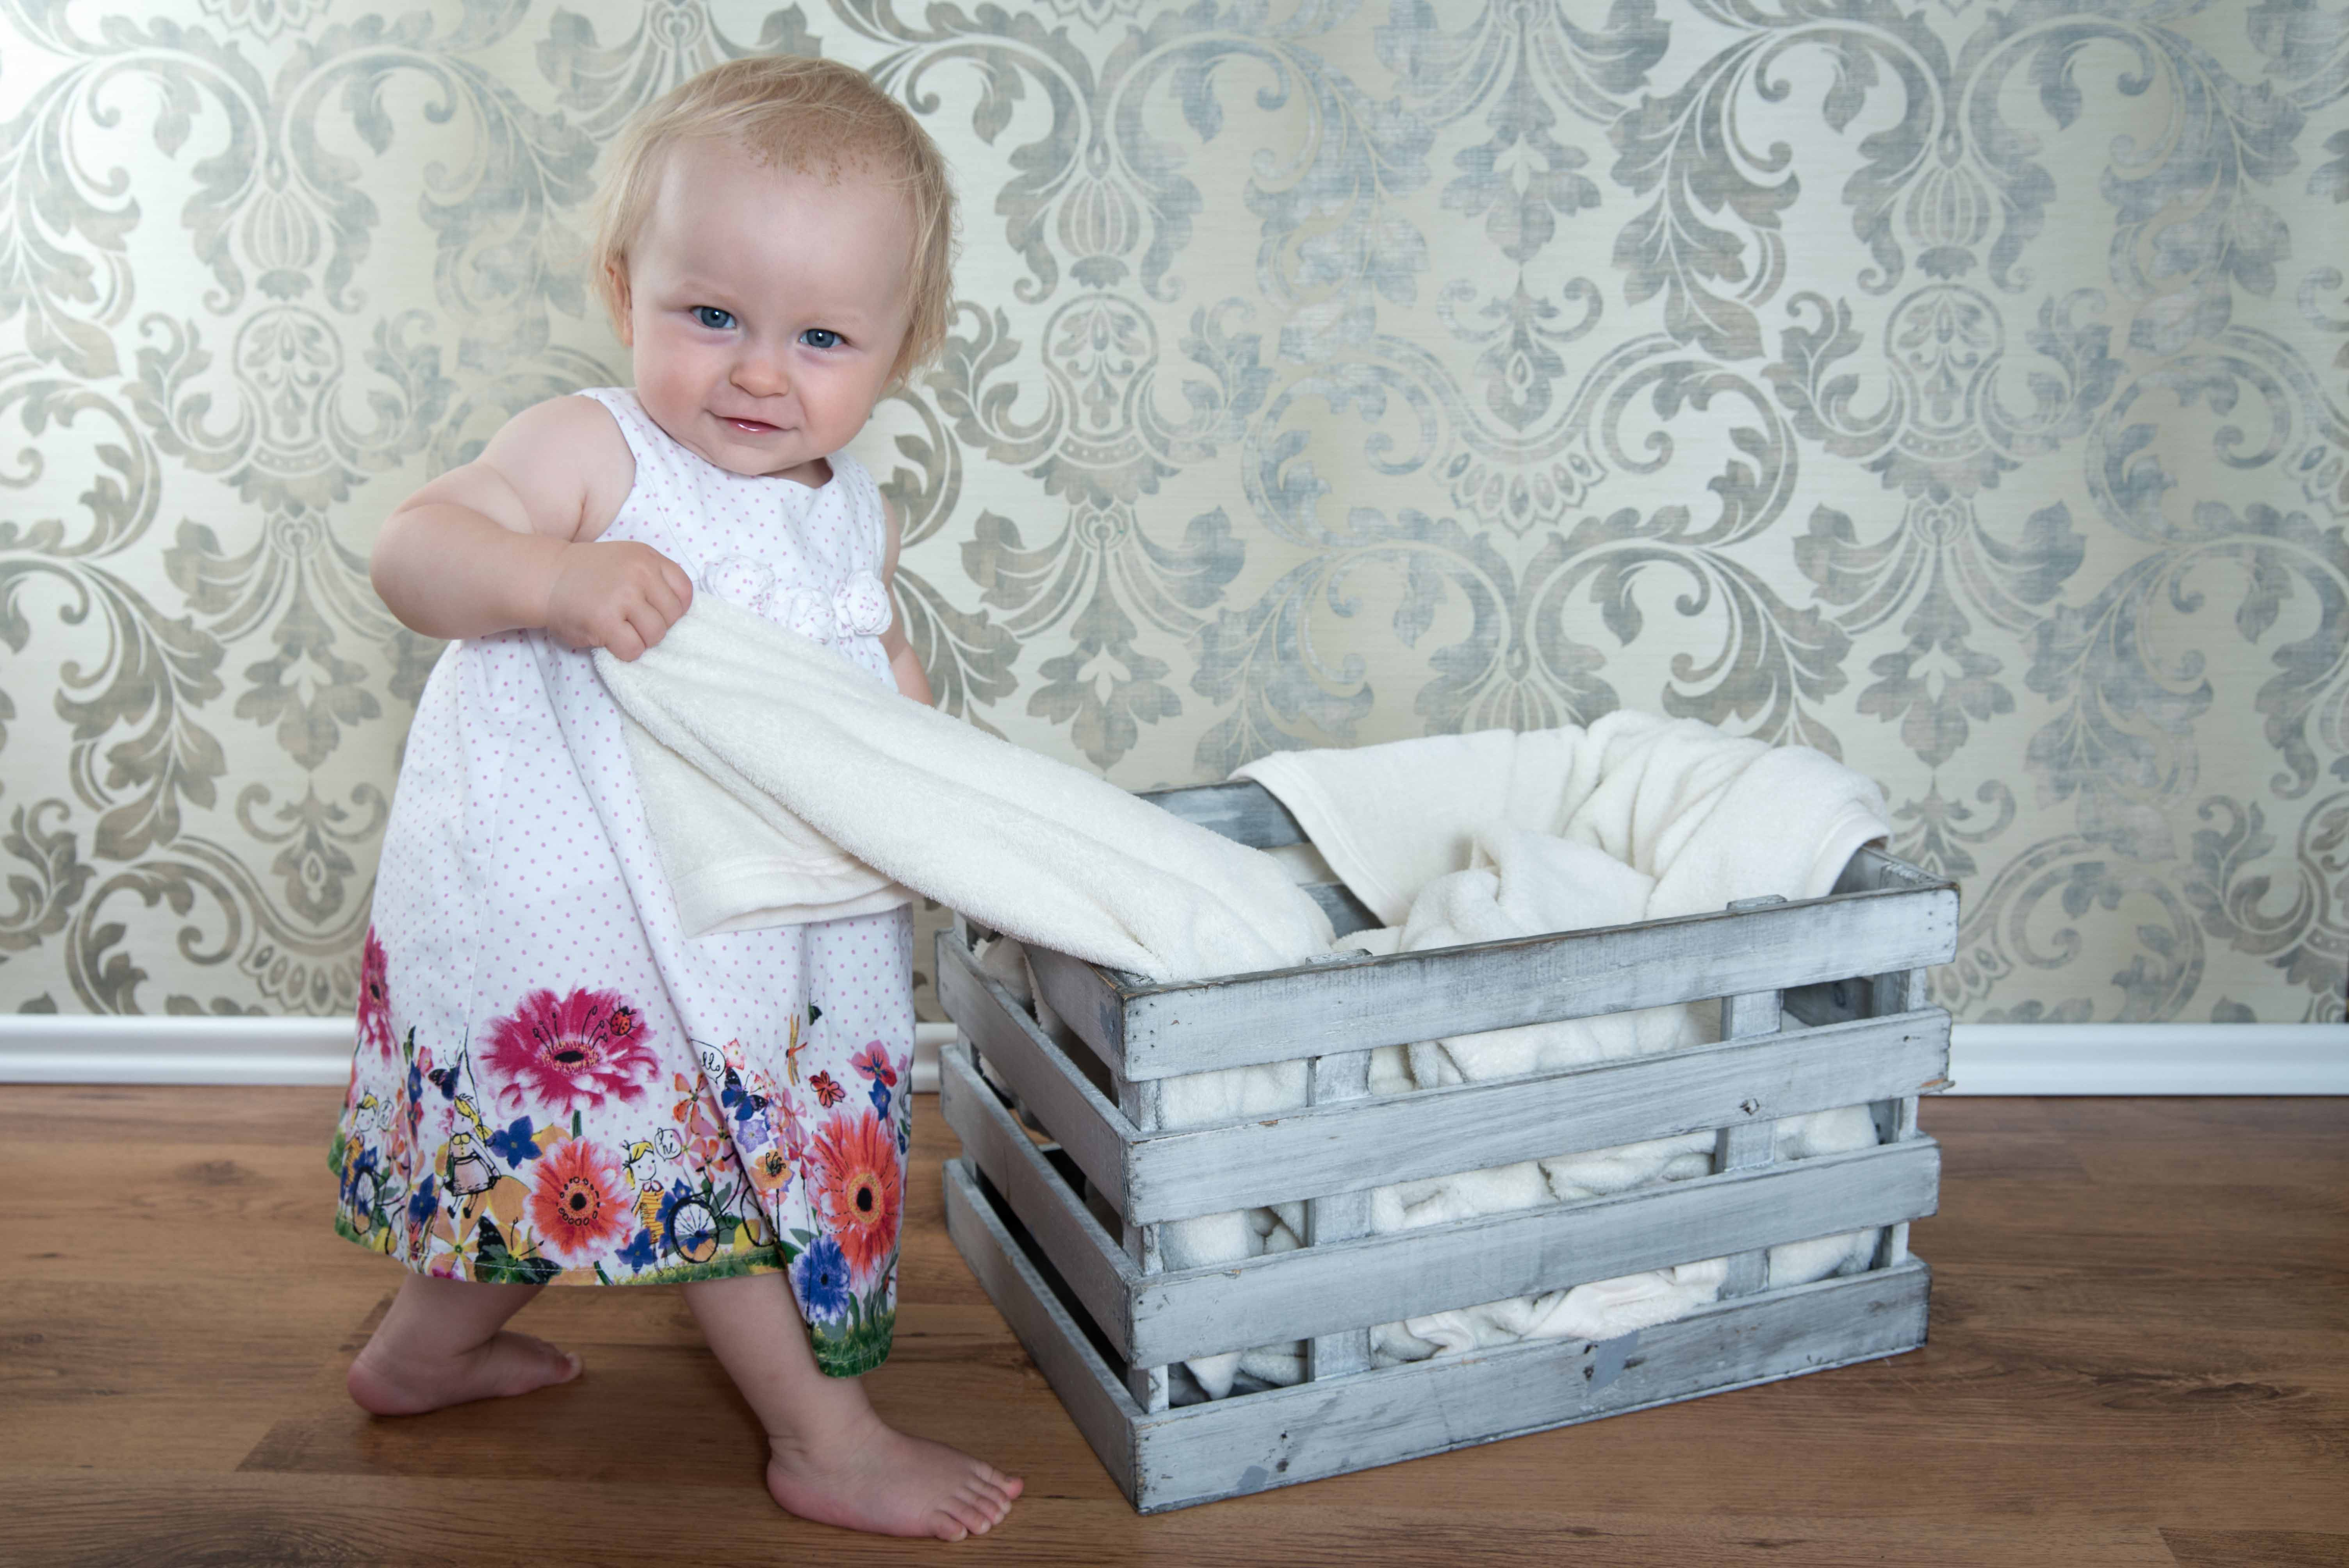 Kinderfotograf Friedberg